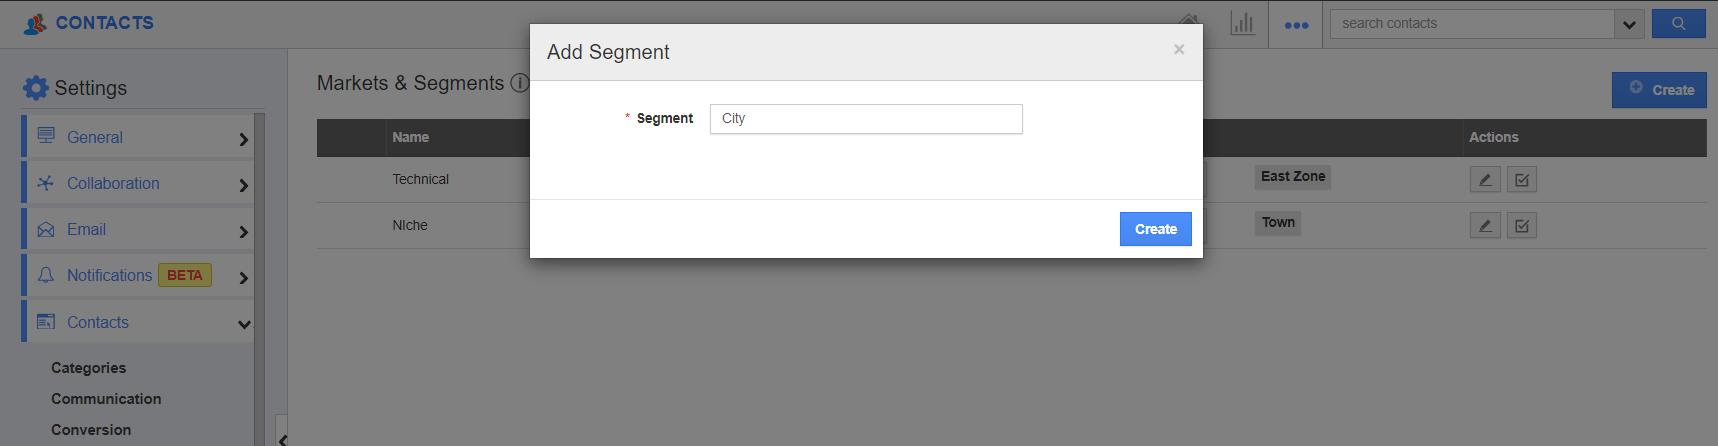 Add Segment